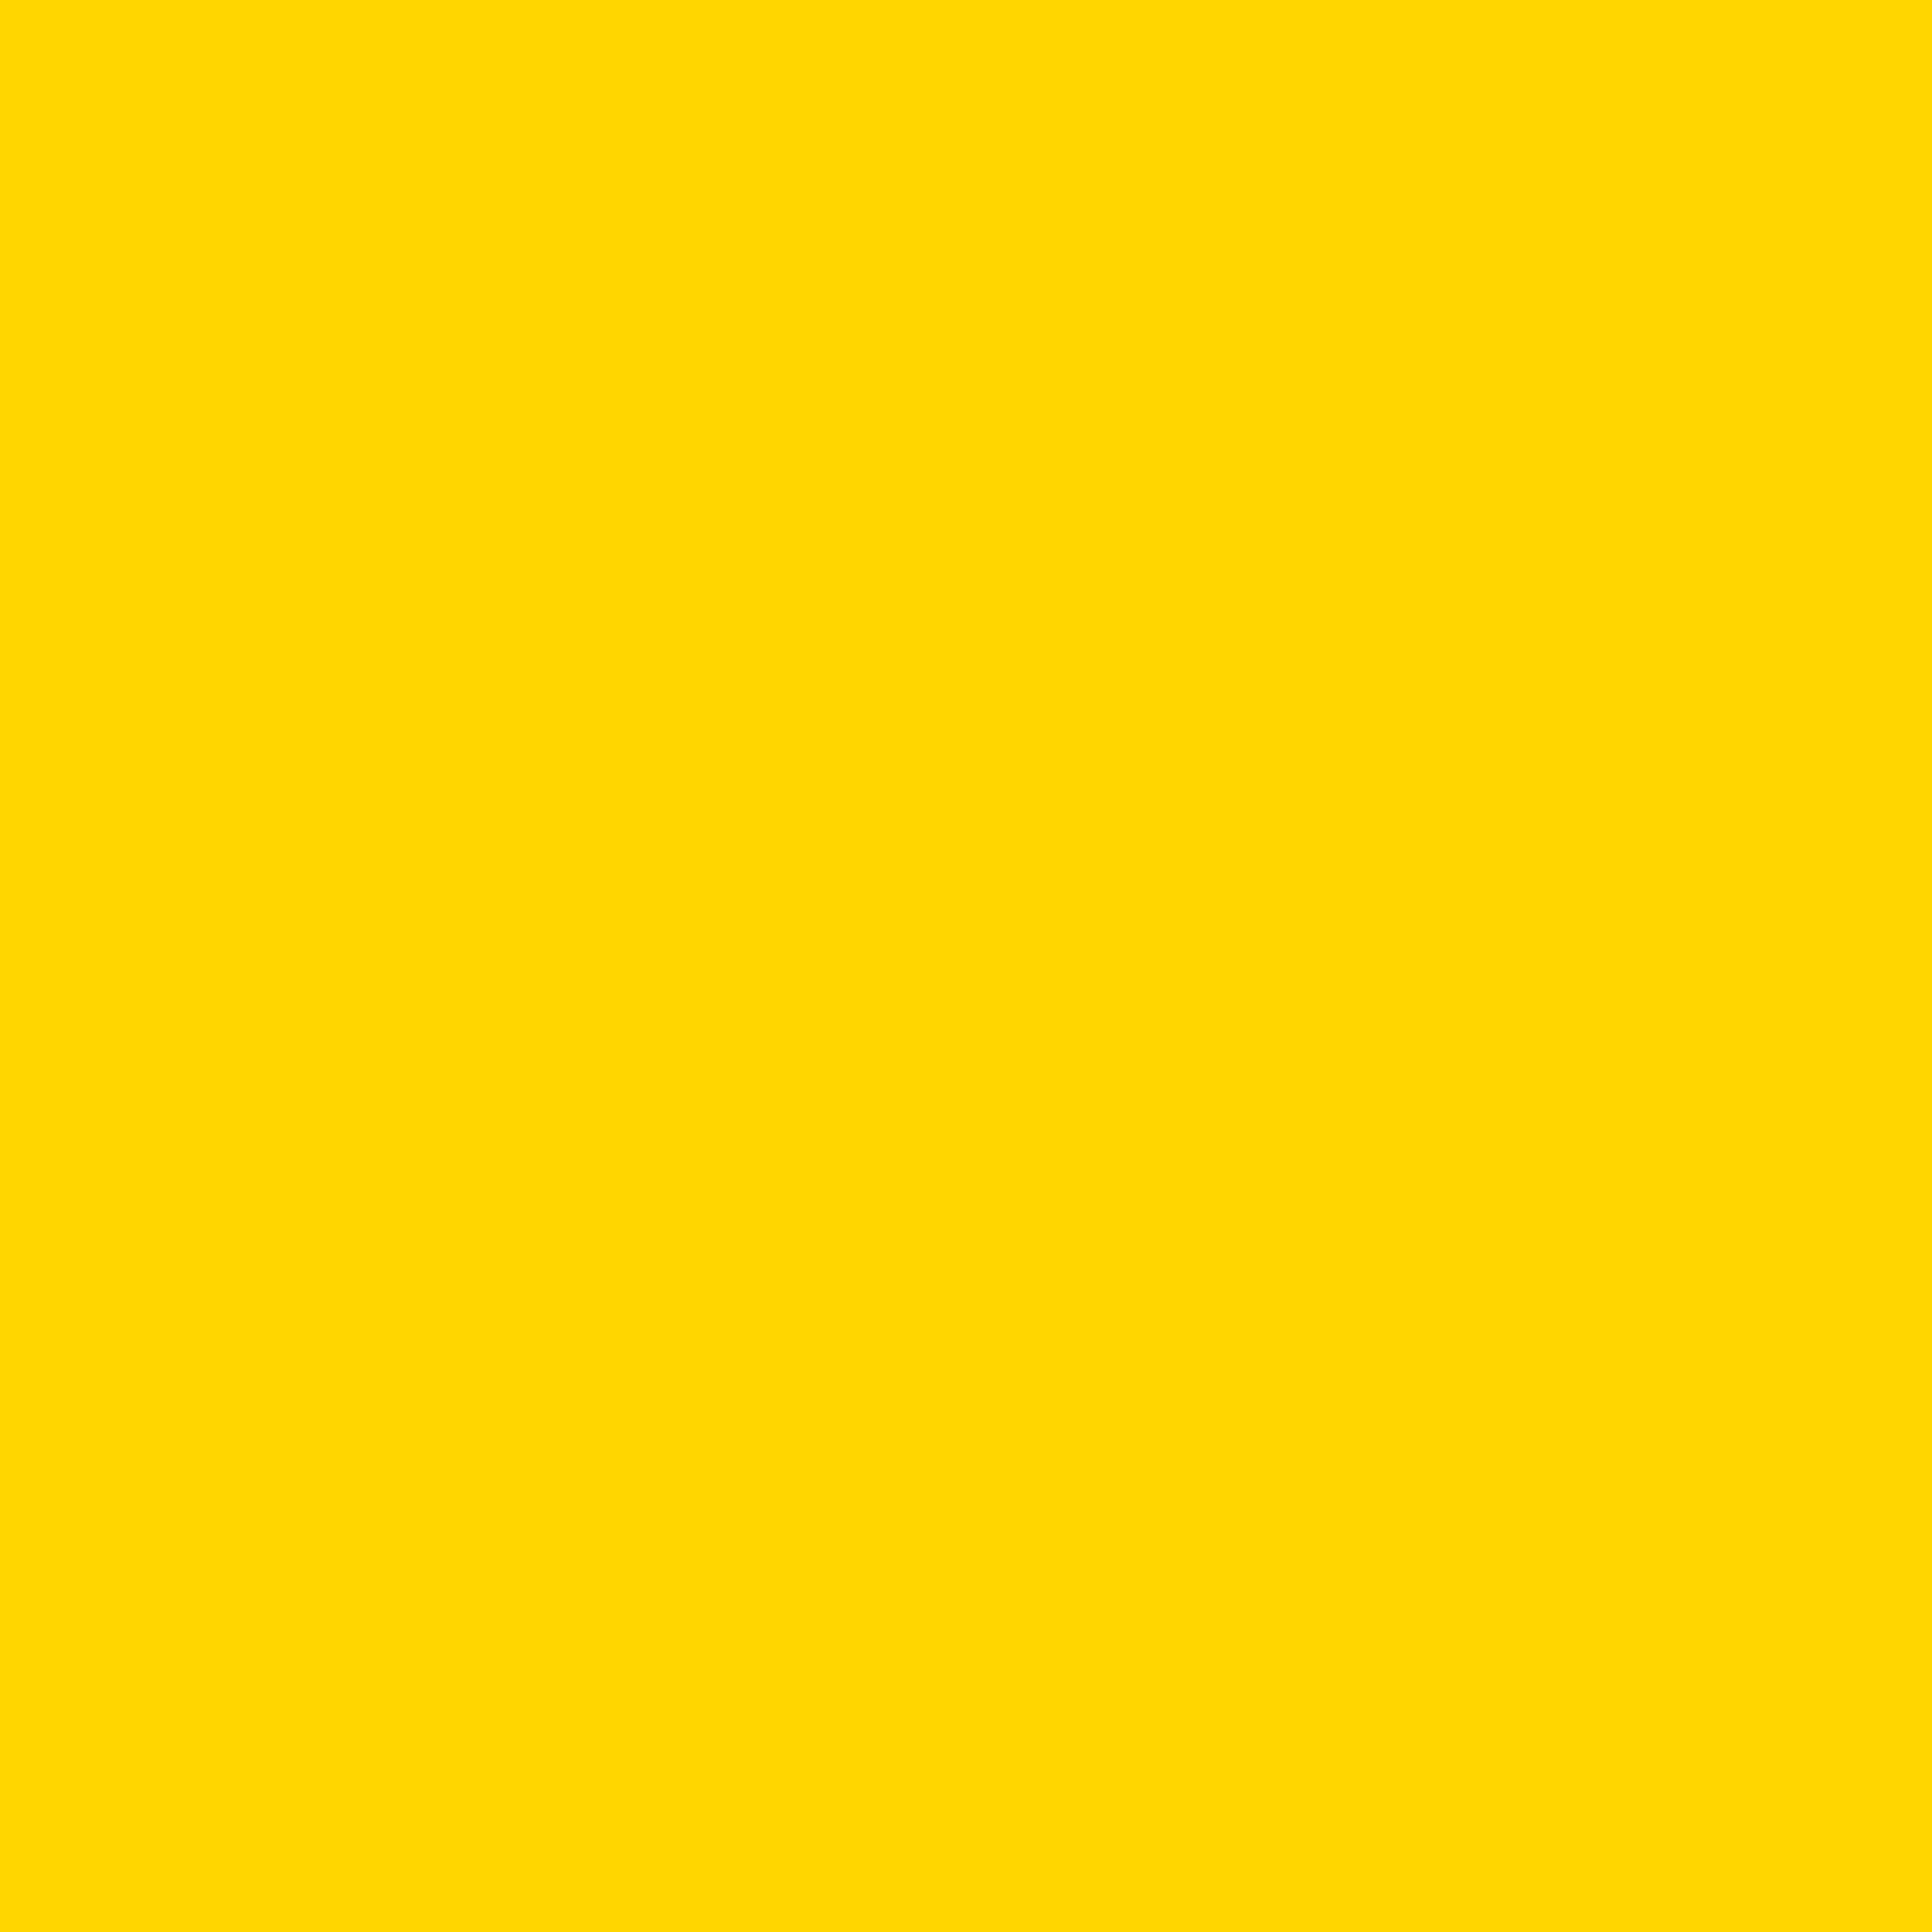 2732x2732 Gold Web Golden Solid Color Background